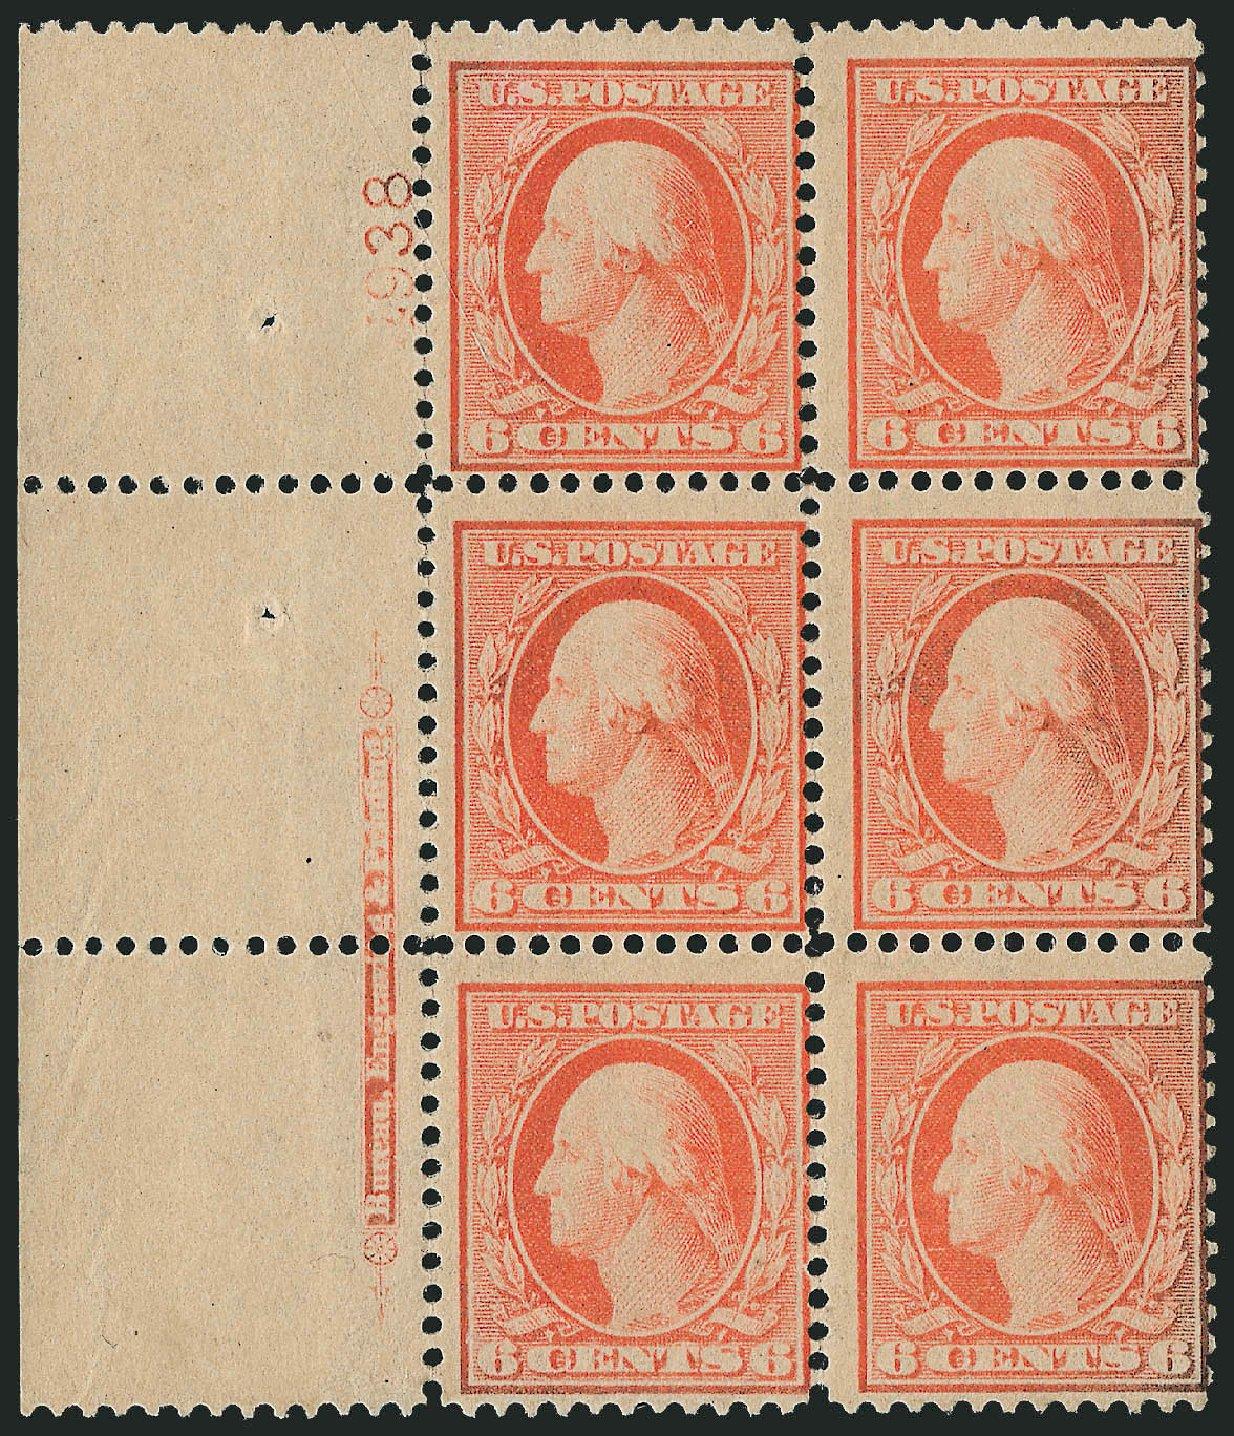 US Stamp Values Scott Cat. #362 - 1909 6c Washington Bluish Paper. Robert Siegel Auction Galleries, Feb 2015, Sale 1093, Lot 166